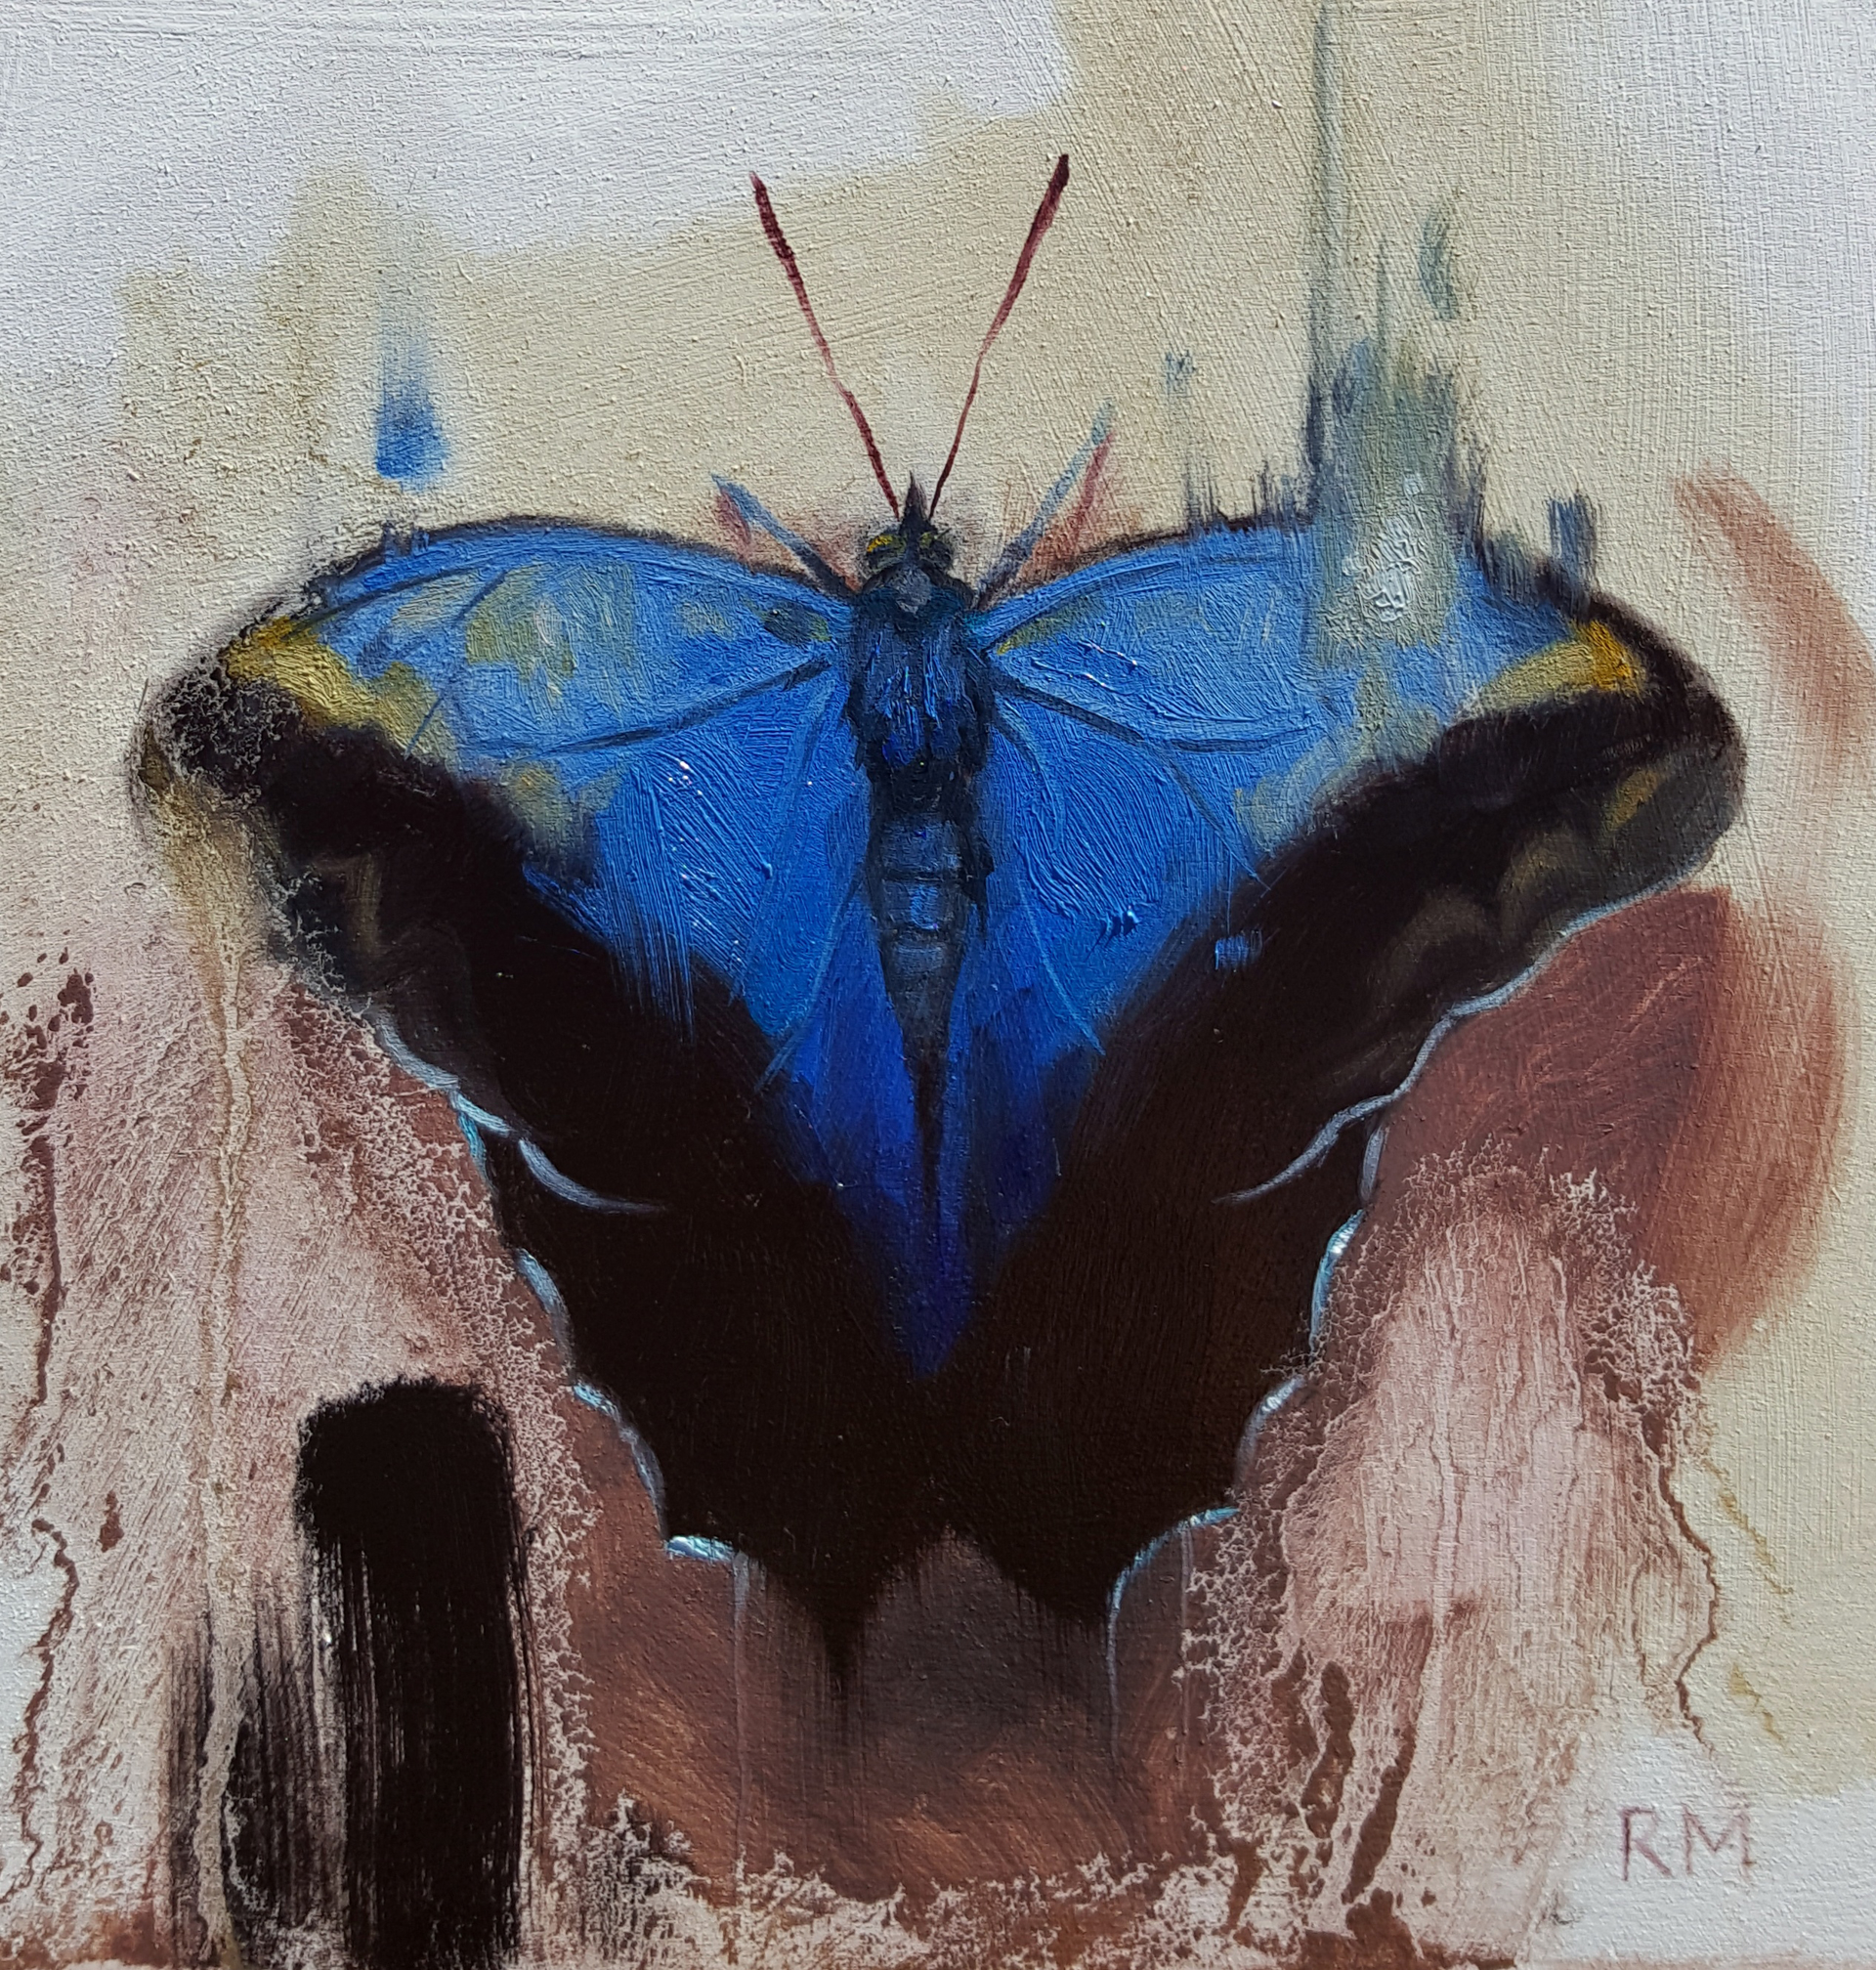 Butterfly 1 by Ryan Morse